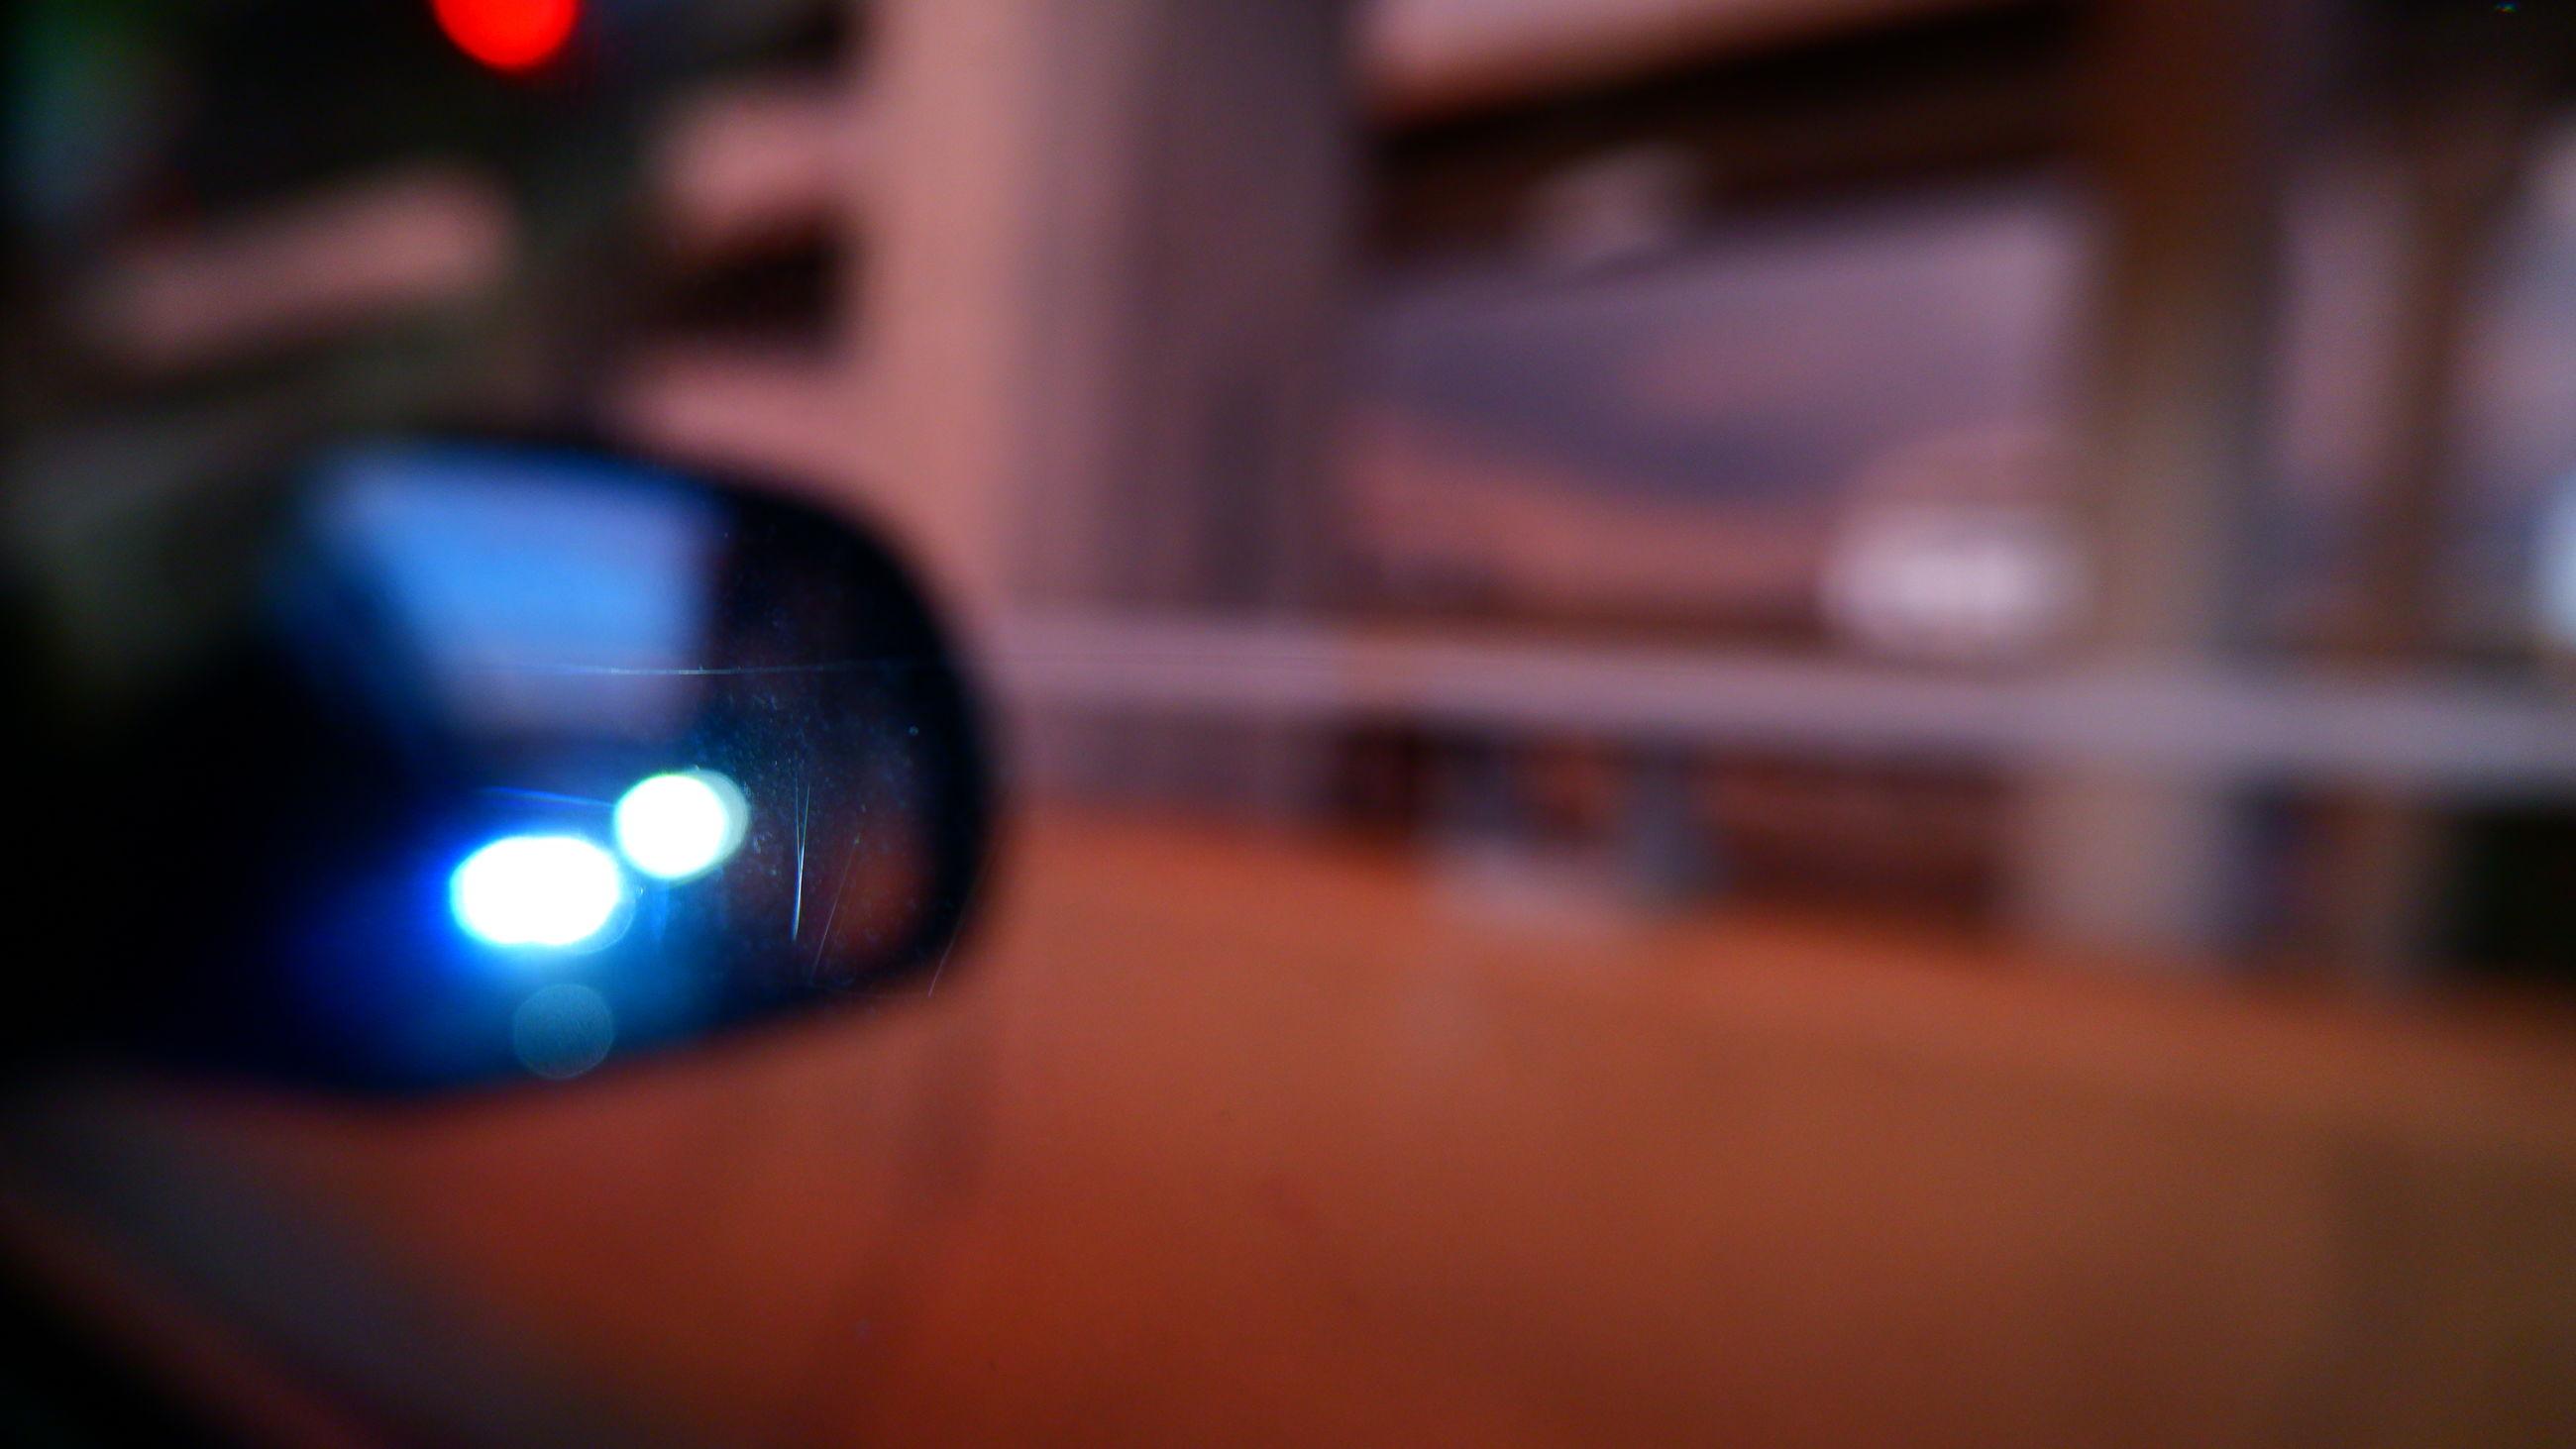 light, illuminated, night, no people, indoors, close-up, focus on foreground, selective focus, technology, lighting, screenshot, transportation, lighting equipment